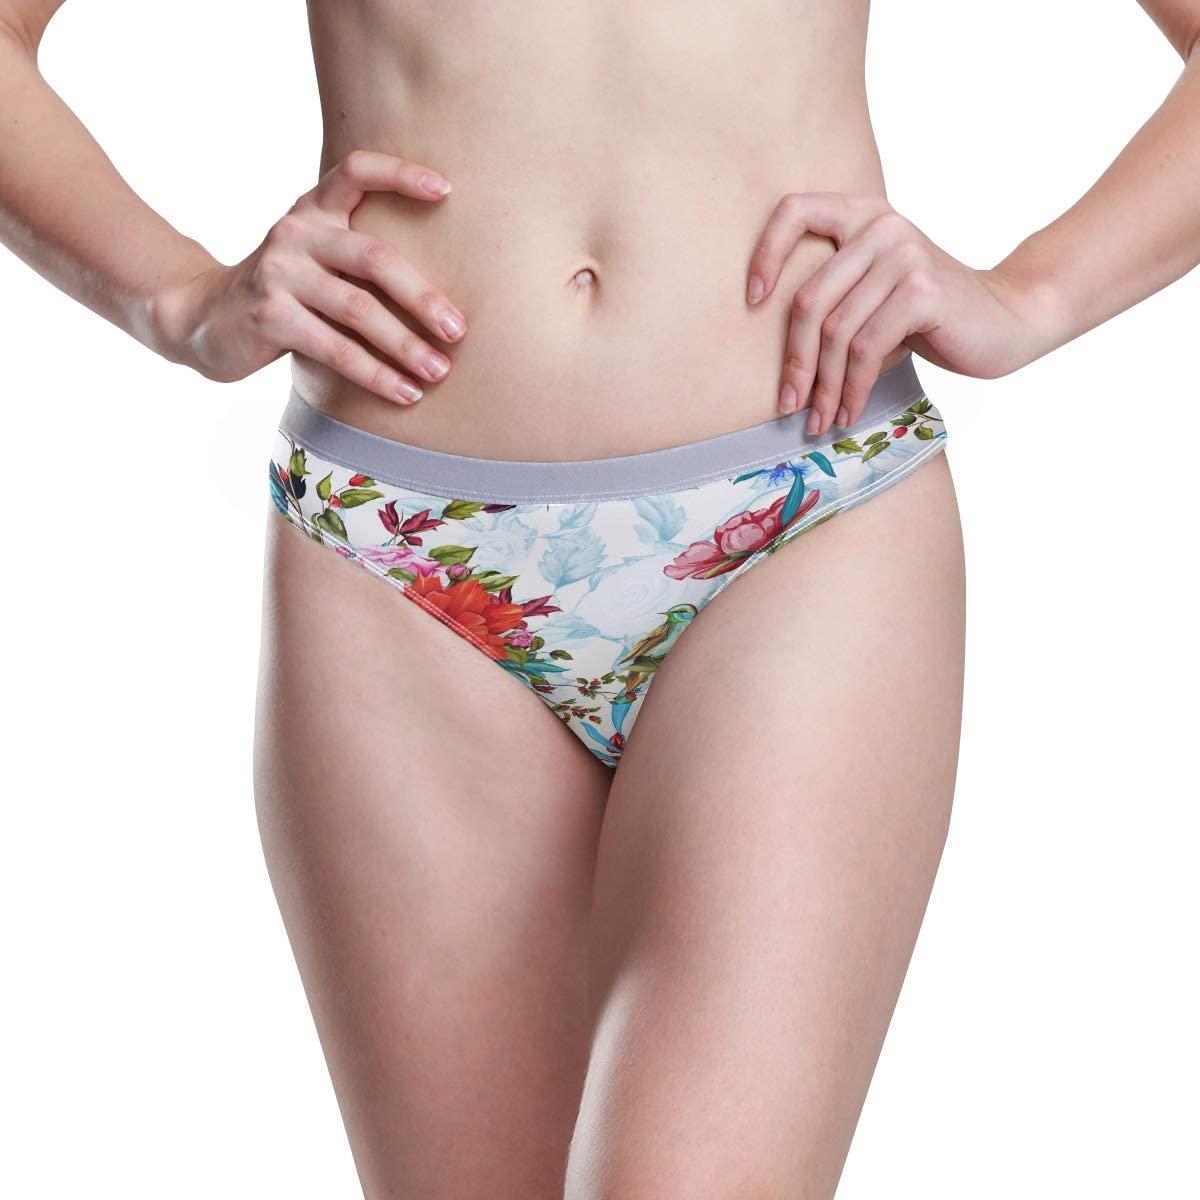 Women Underwear Bikini Poppy Wild Flower Roses Nightingale Birds 3D Printed Sexy Low Waist Panties Hipster Comfy Briefs S